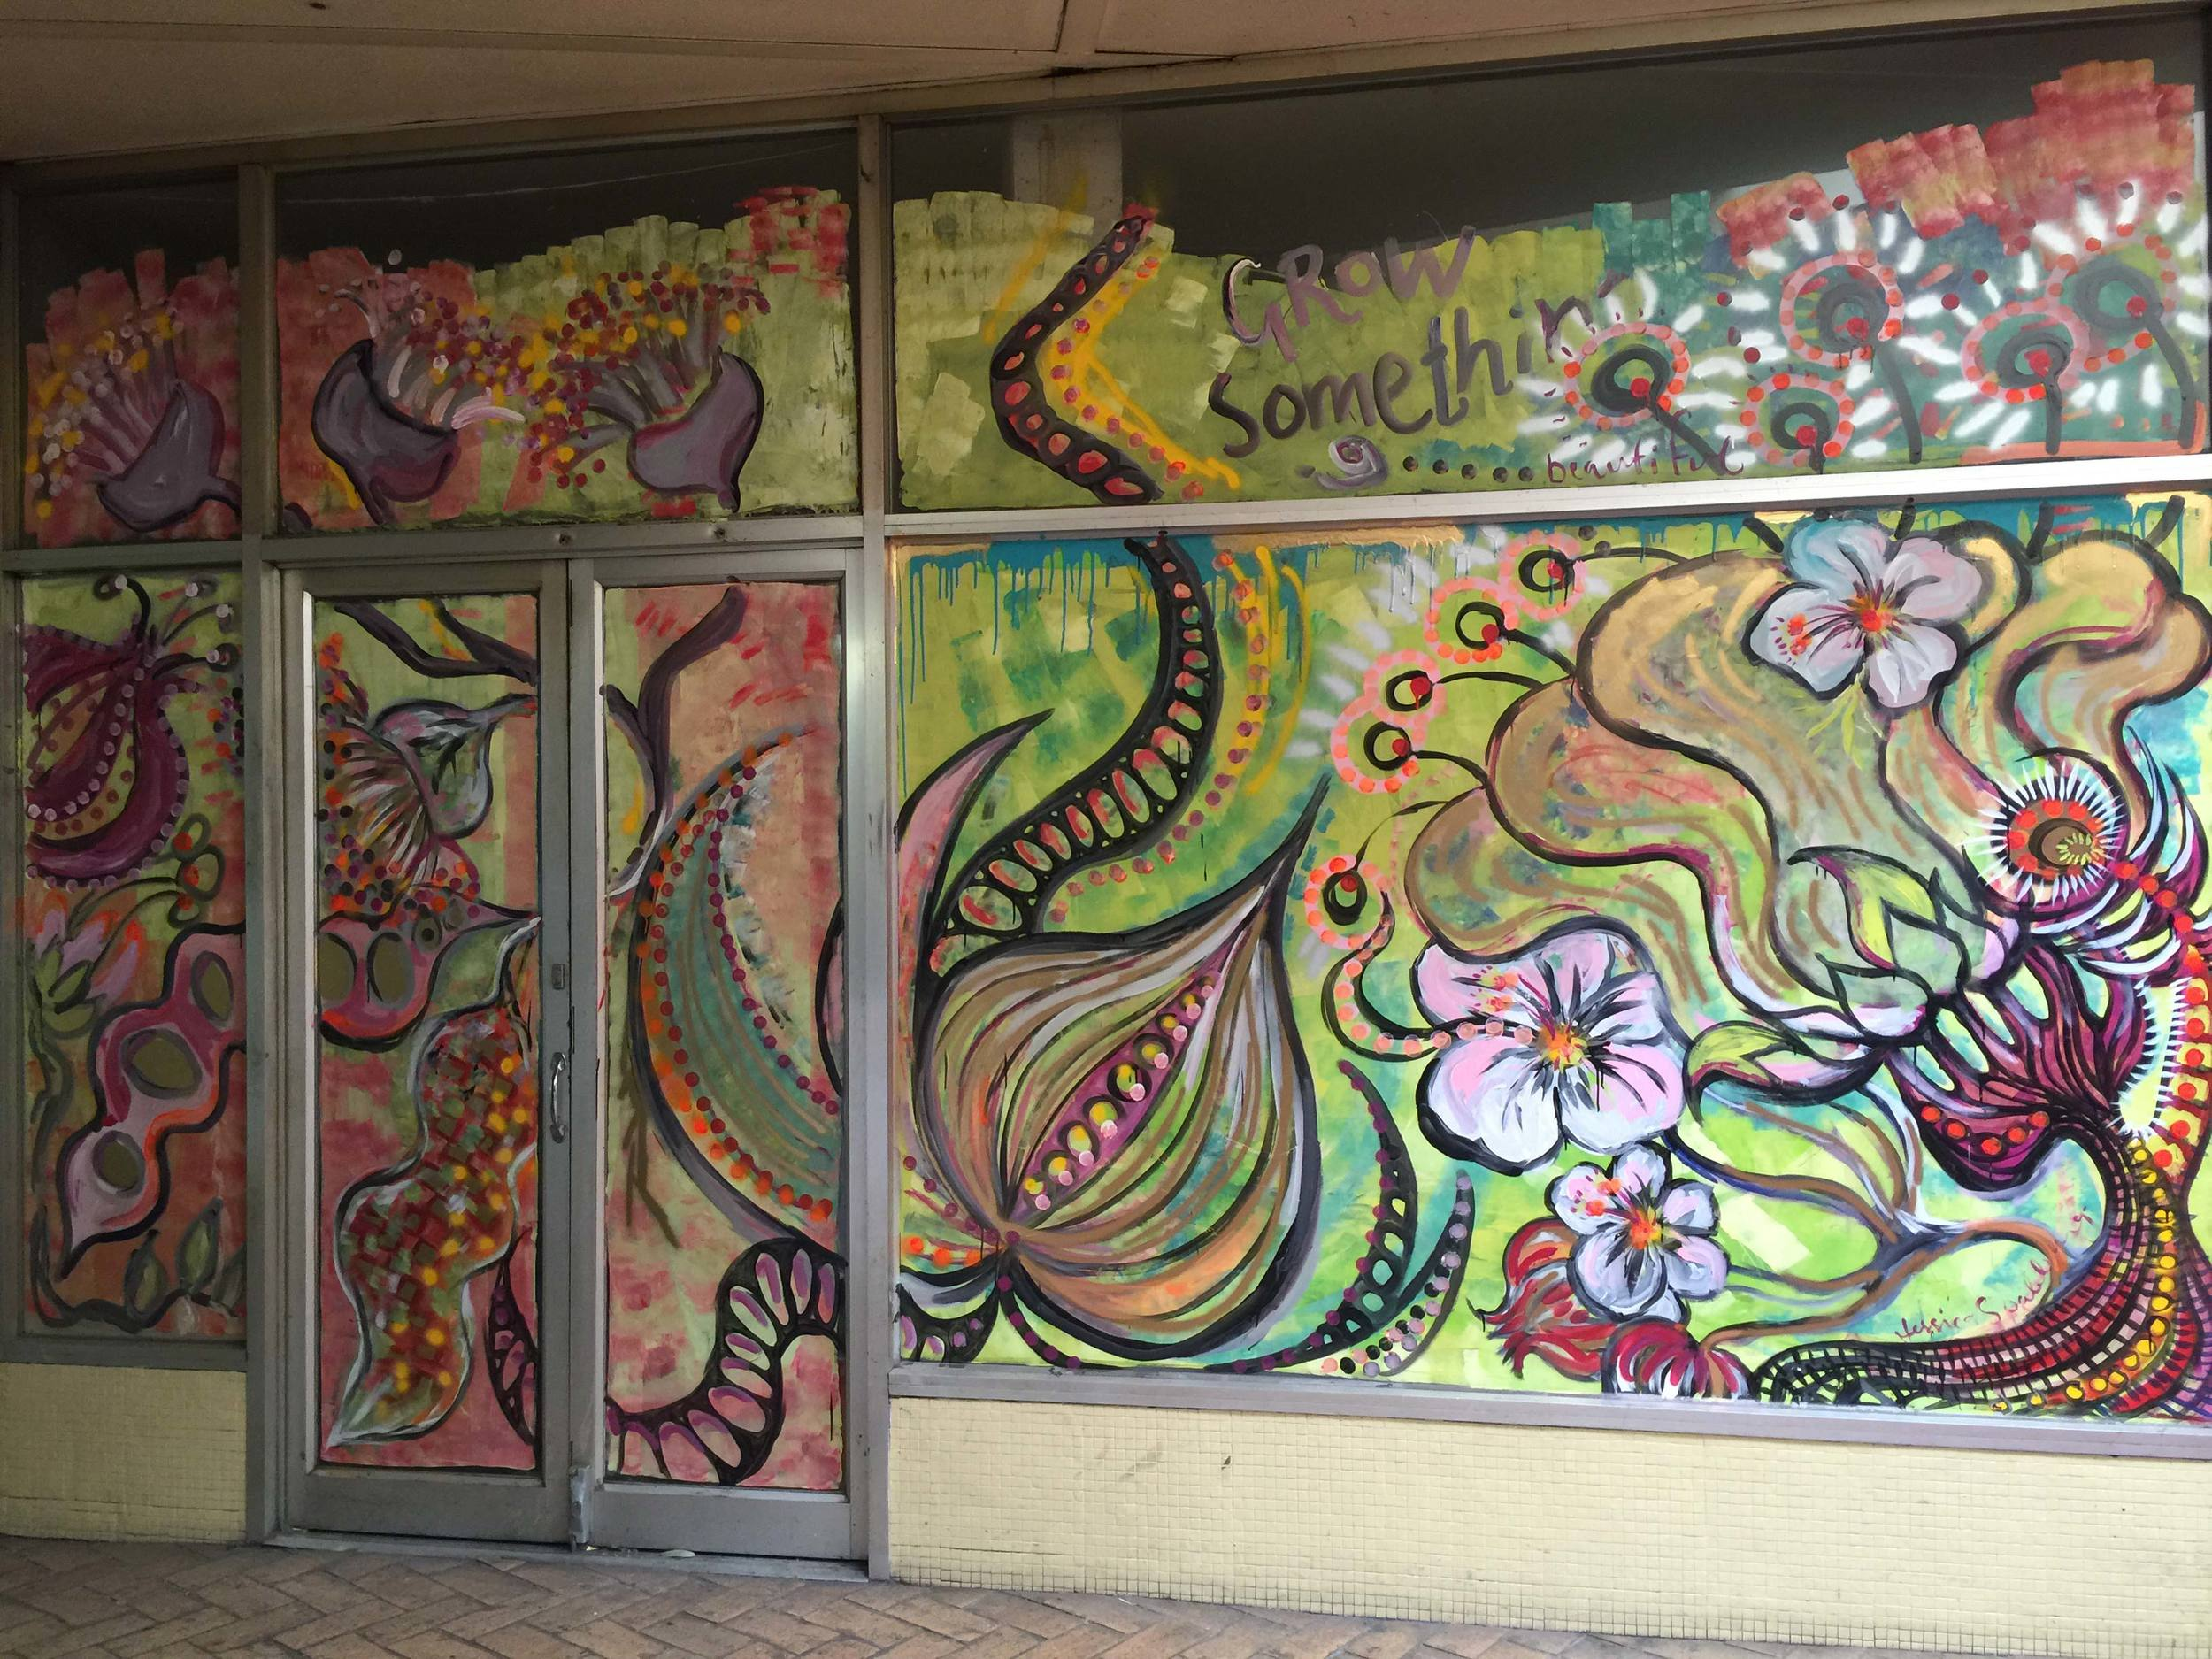 grow-something-organic-art-mural-allans-walk-bendigo